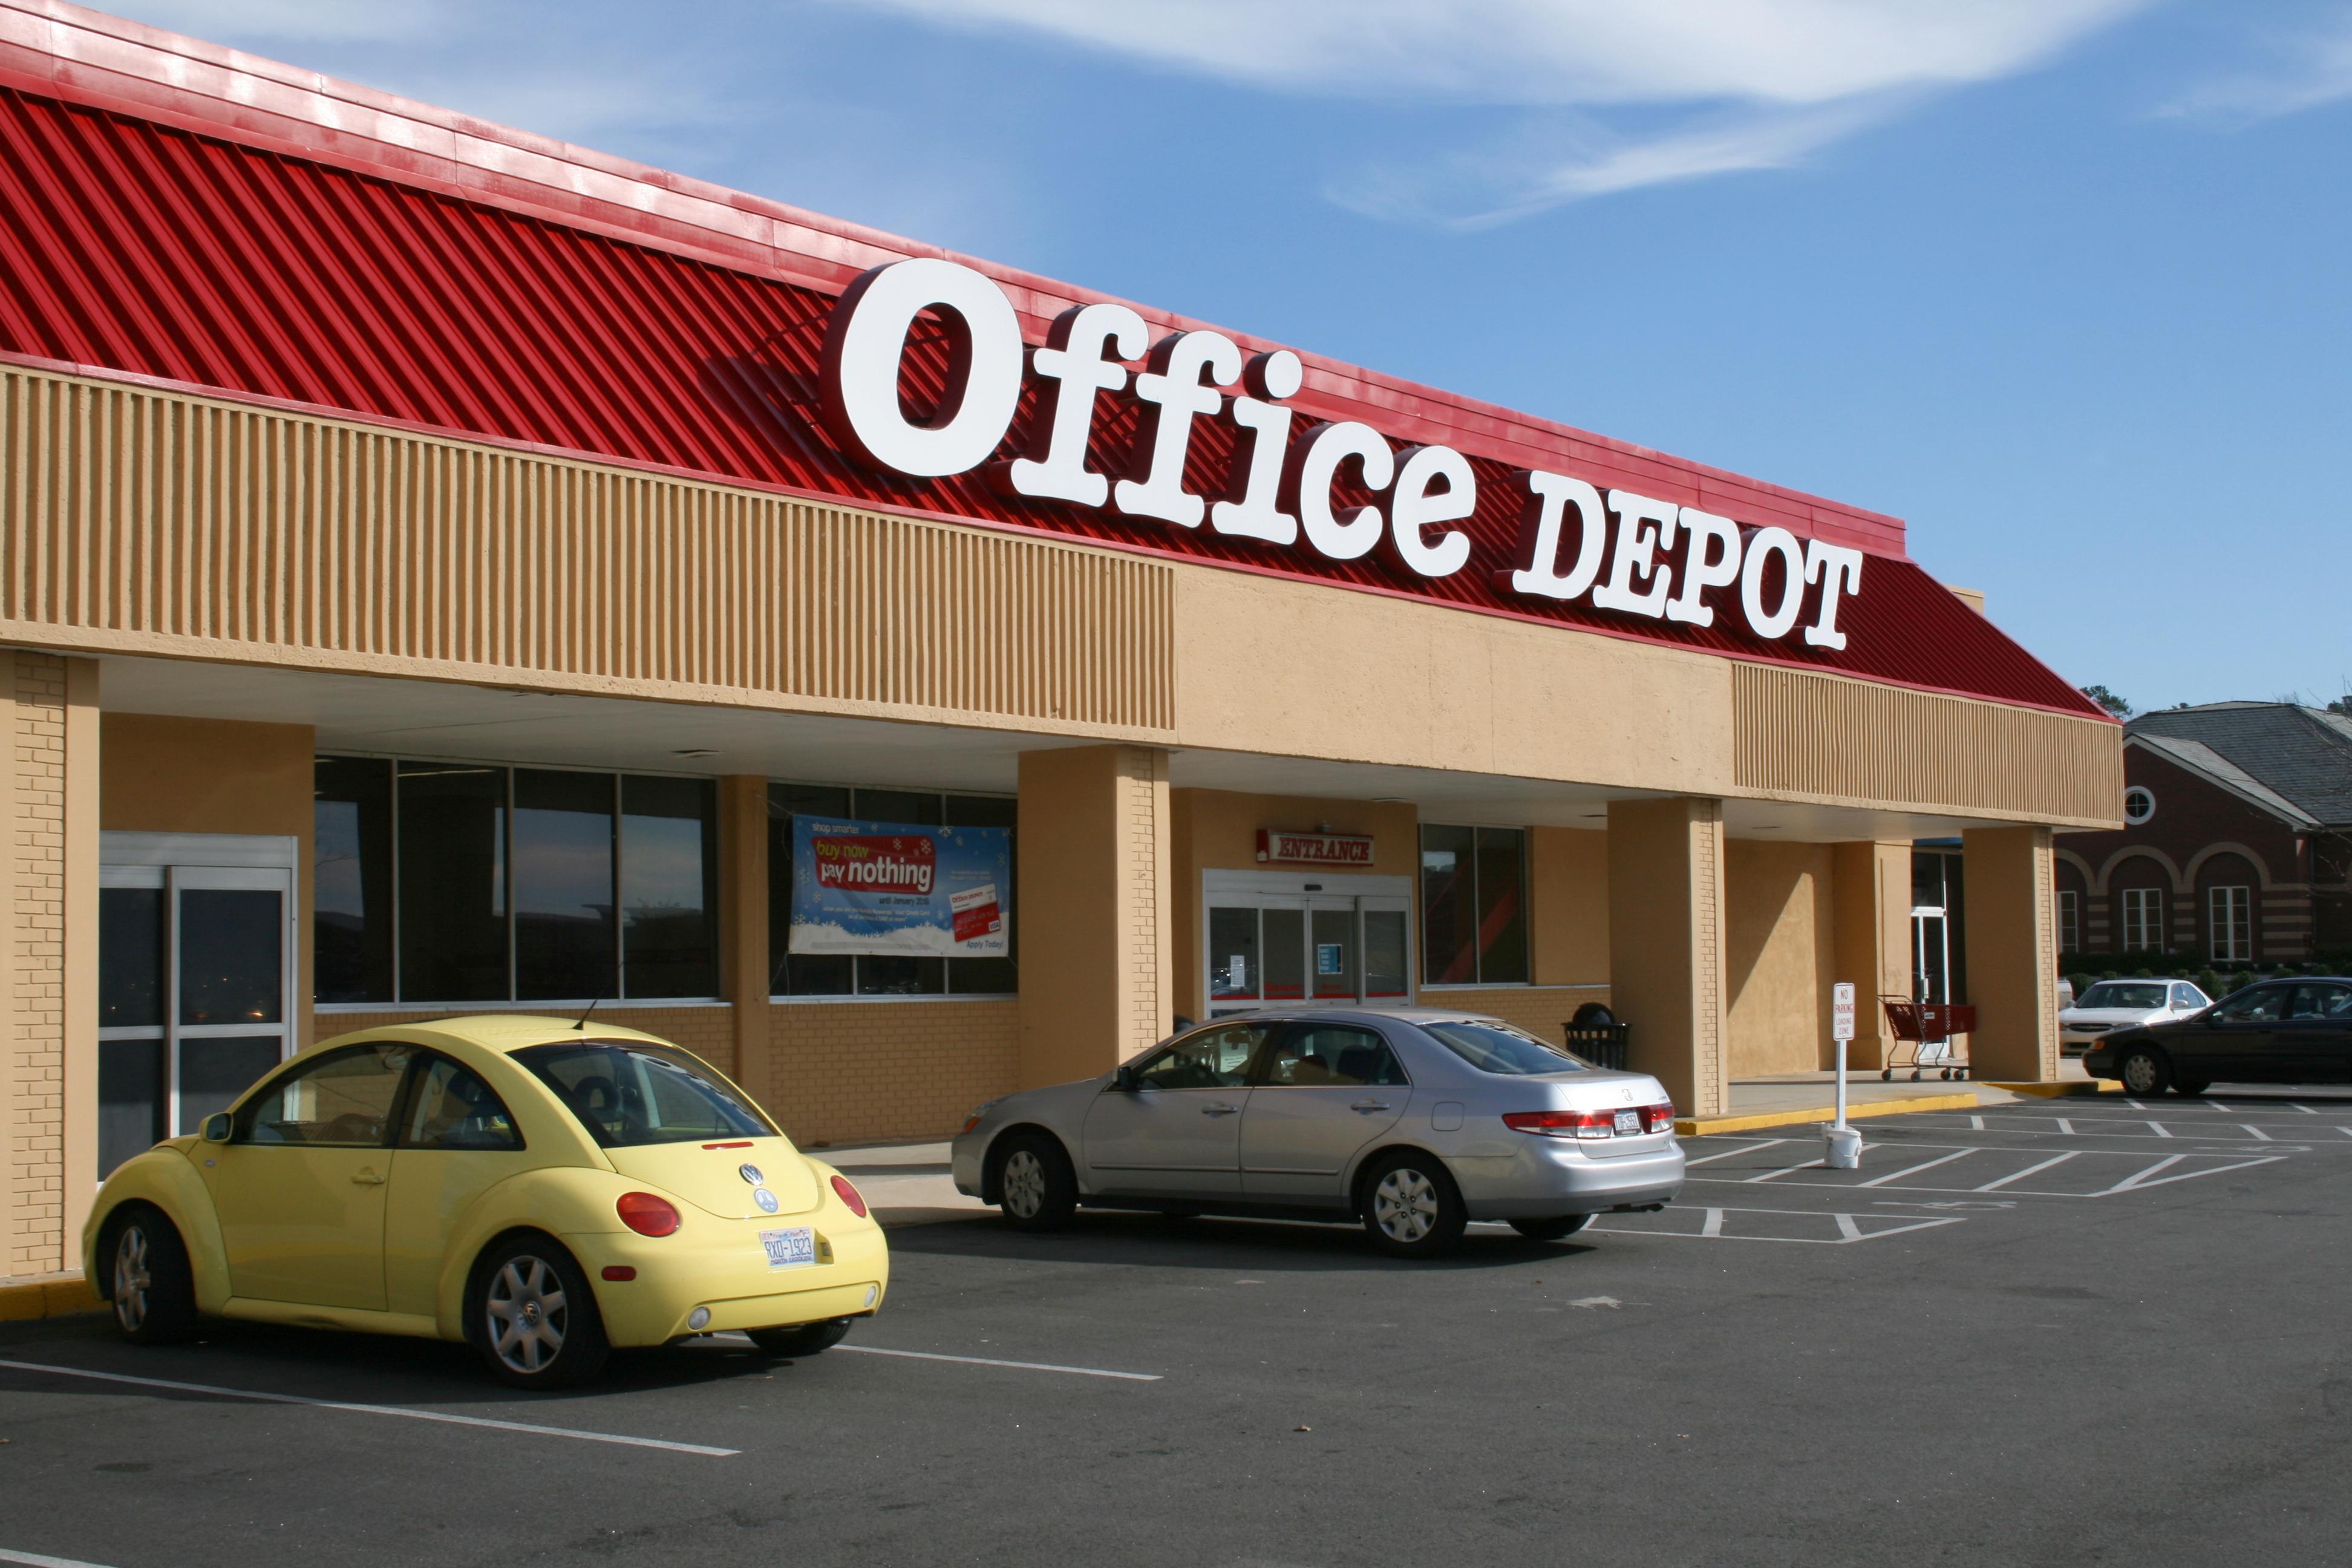 File:2008-11-22 Office Depot in Durham.jpg - Wikimedia Commons